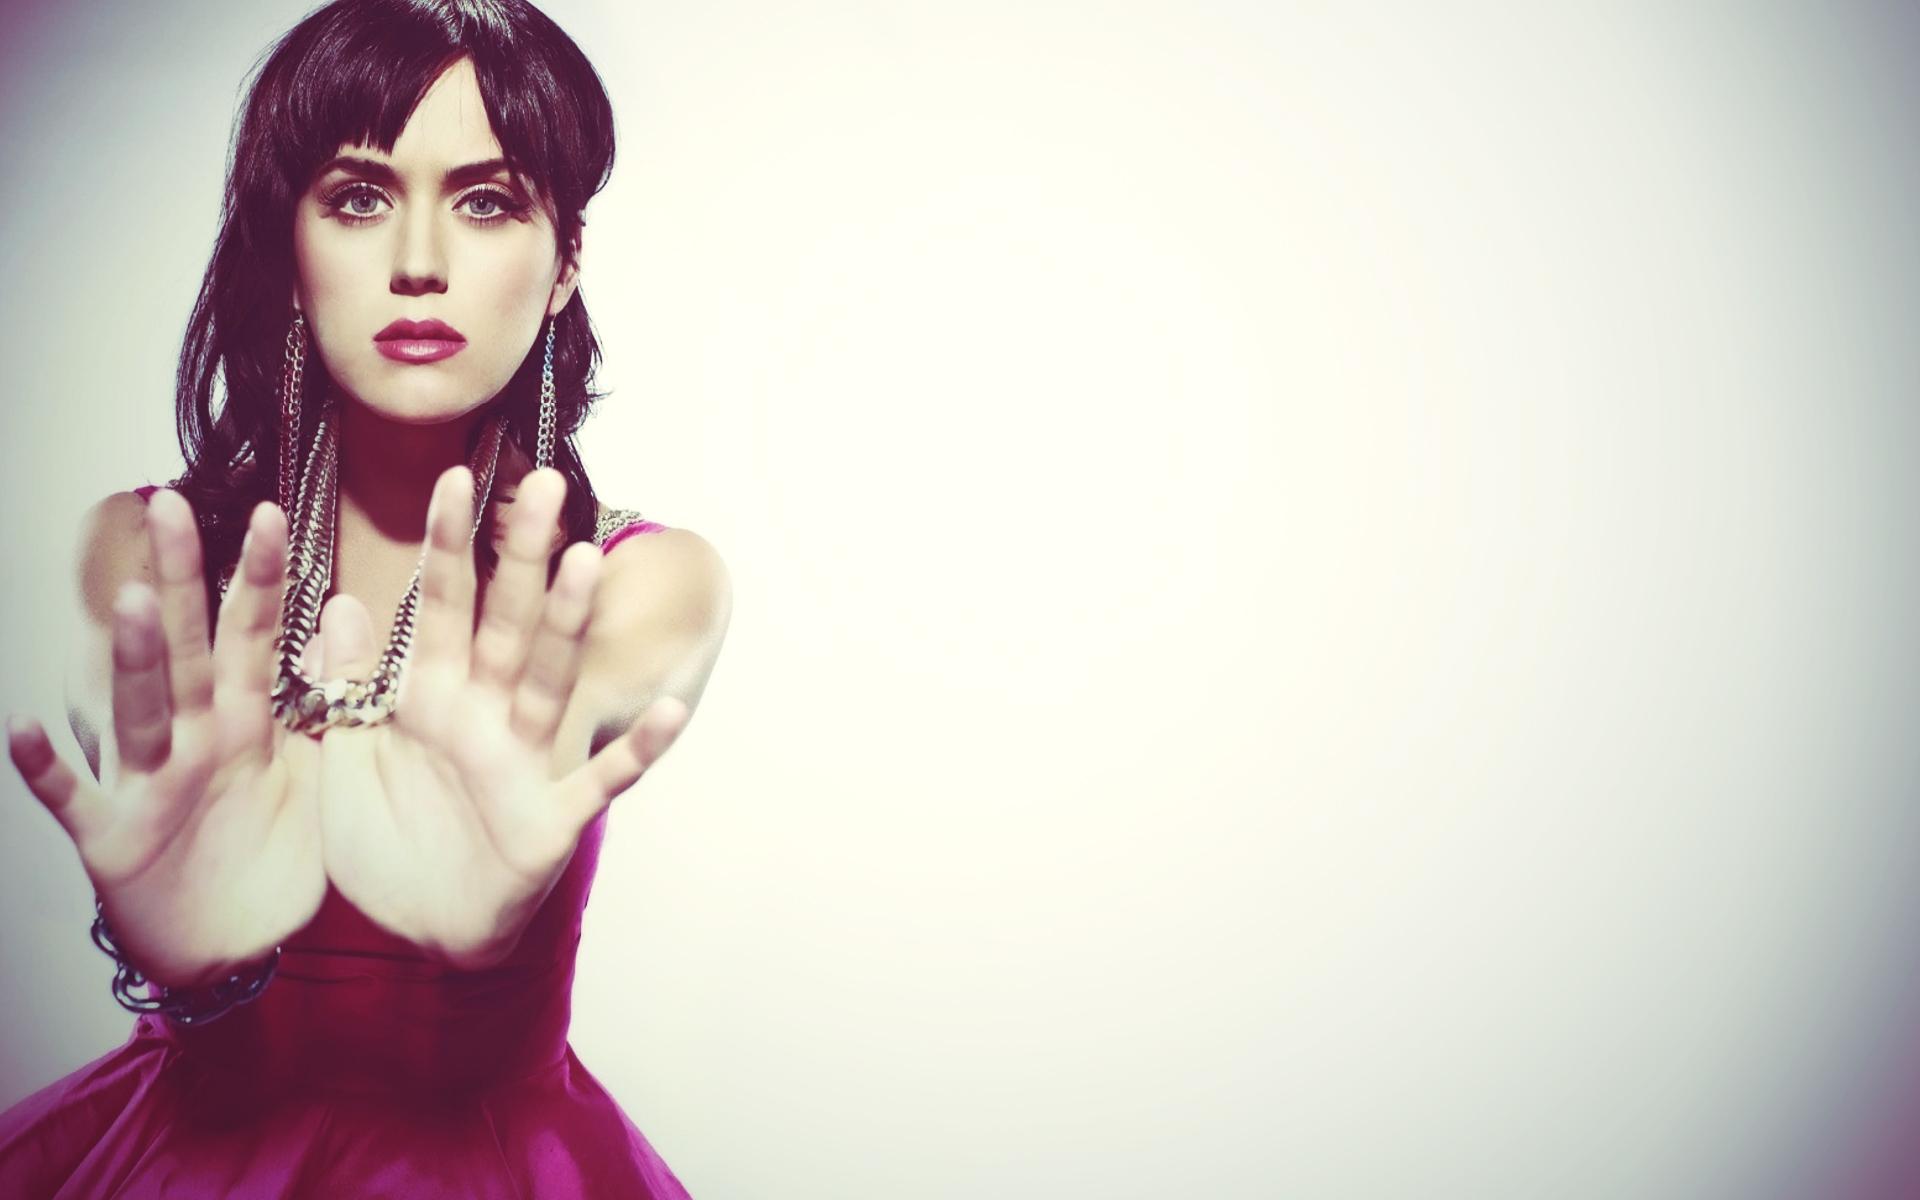 Katy Perry Wallpaper 6